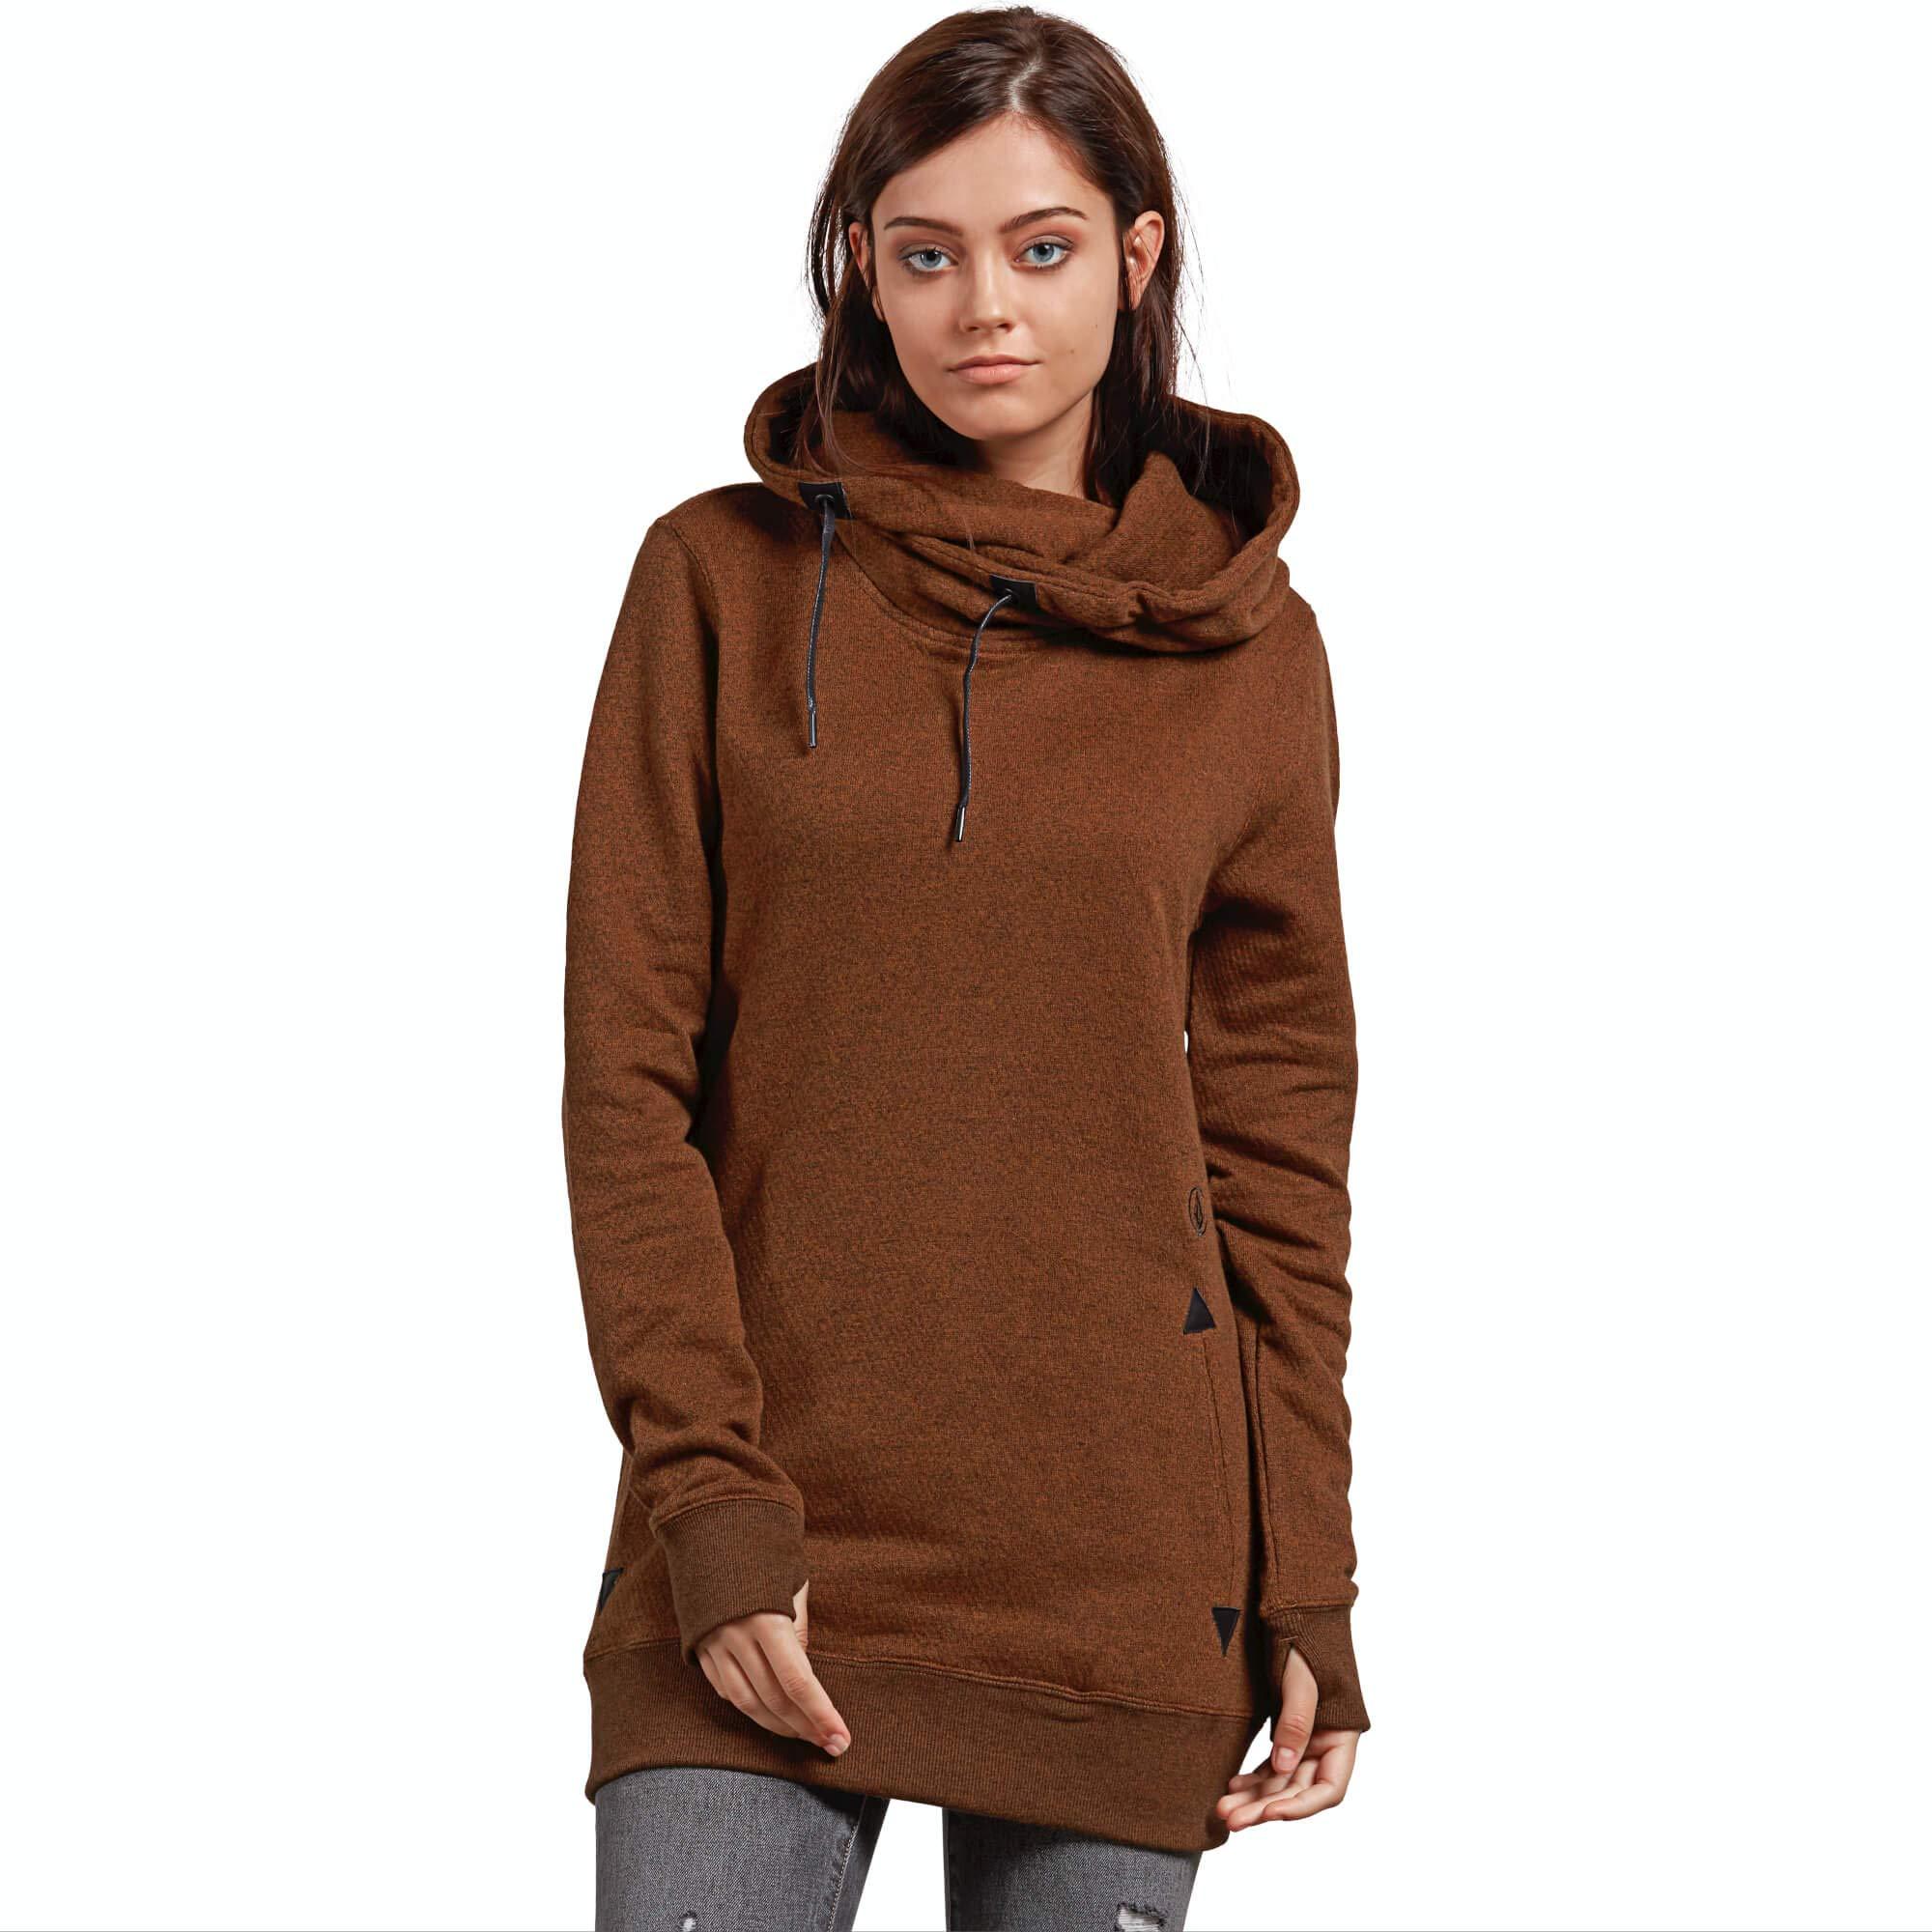 Volcom Women's Tower Pullover Heather Fleece Hooded Baselayer Sweatshirt, Copper, Large